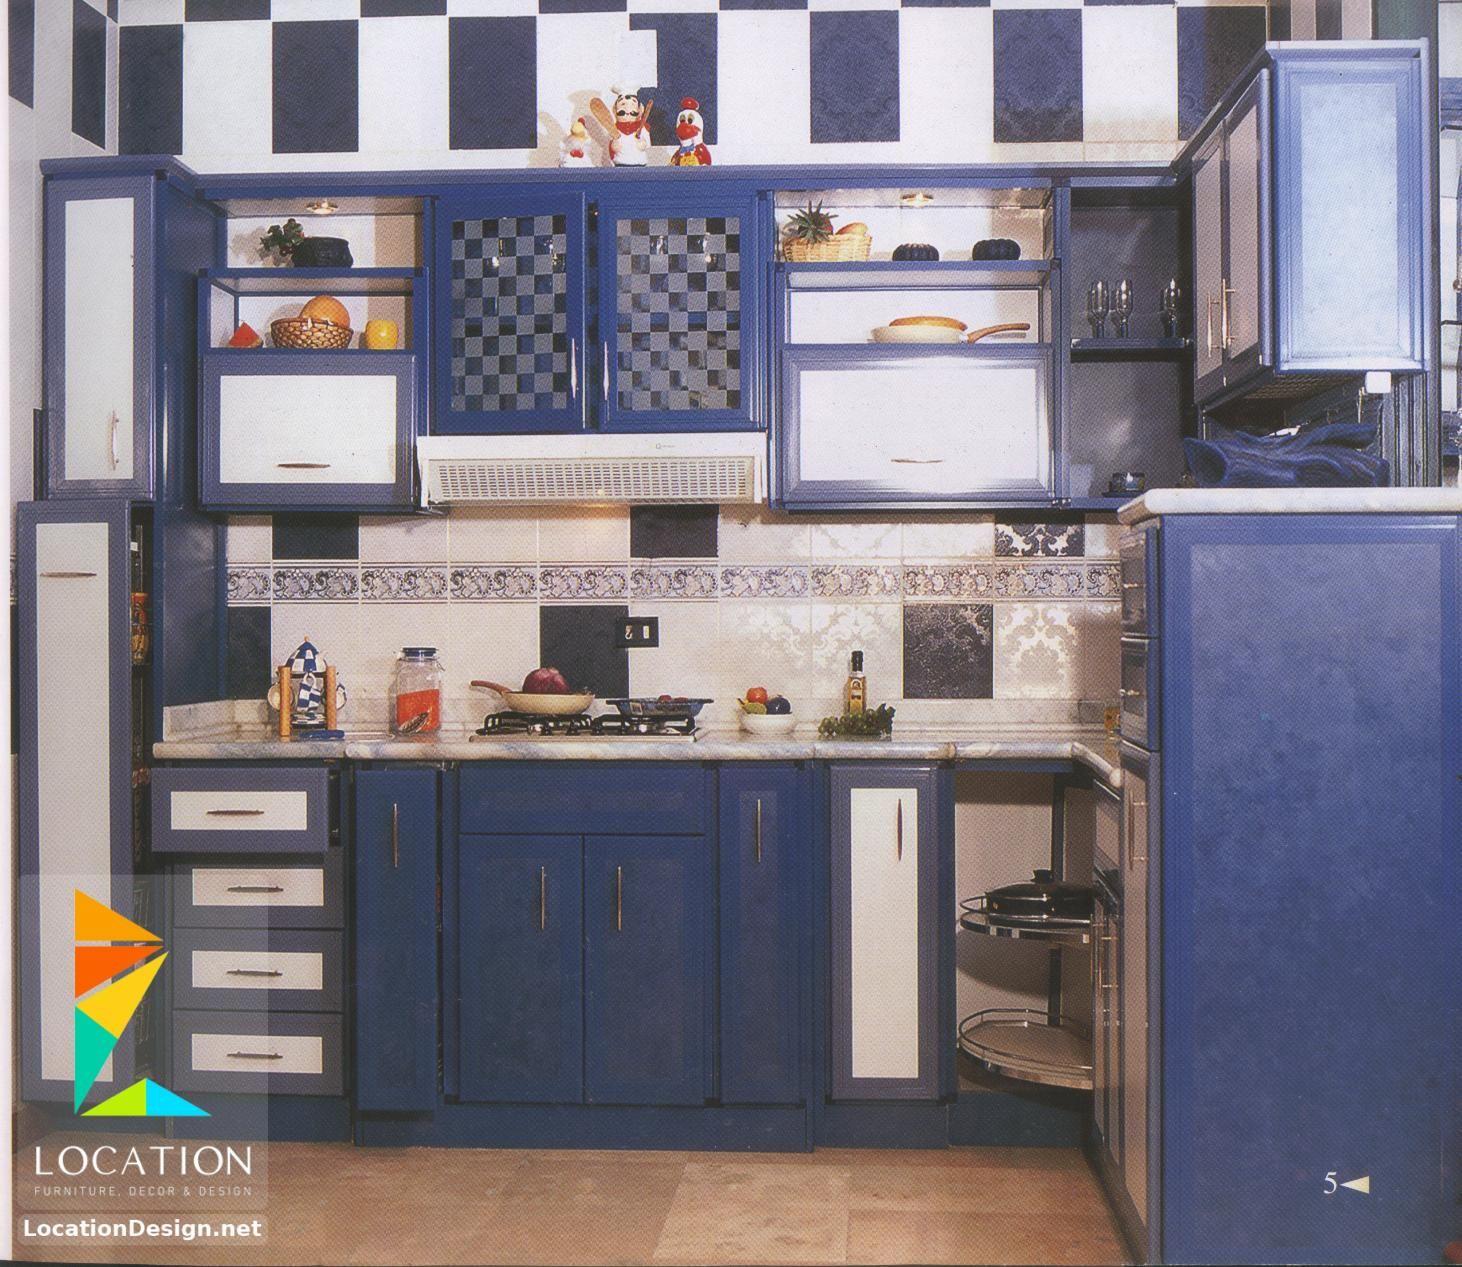 مطابخ الوميتال 2018 2019 تصاميم وديكورات مطابخ حديثة Home Diy Kitchen Cabinets Home